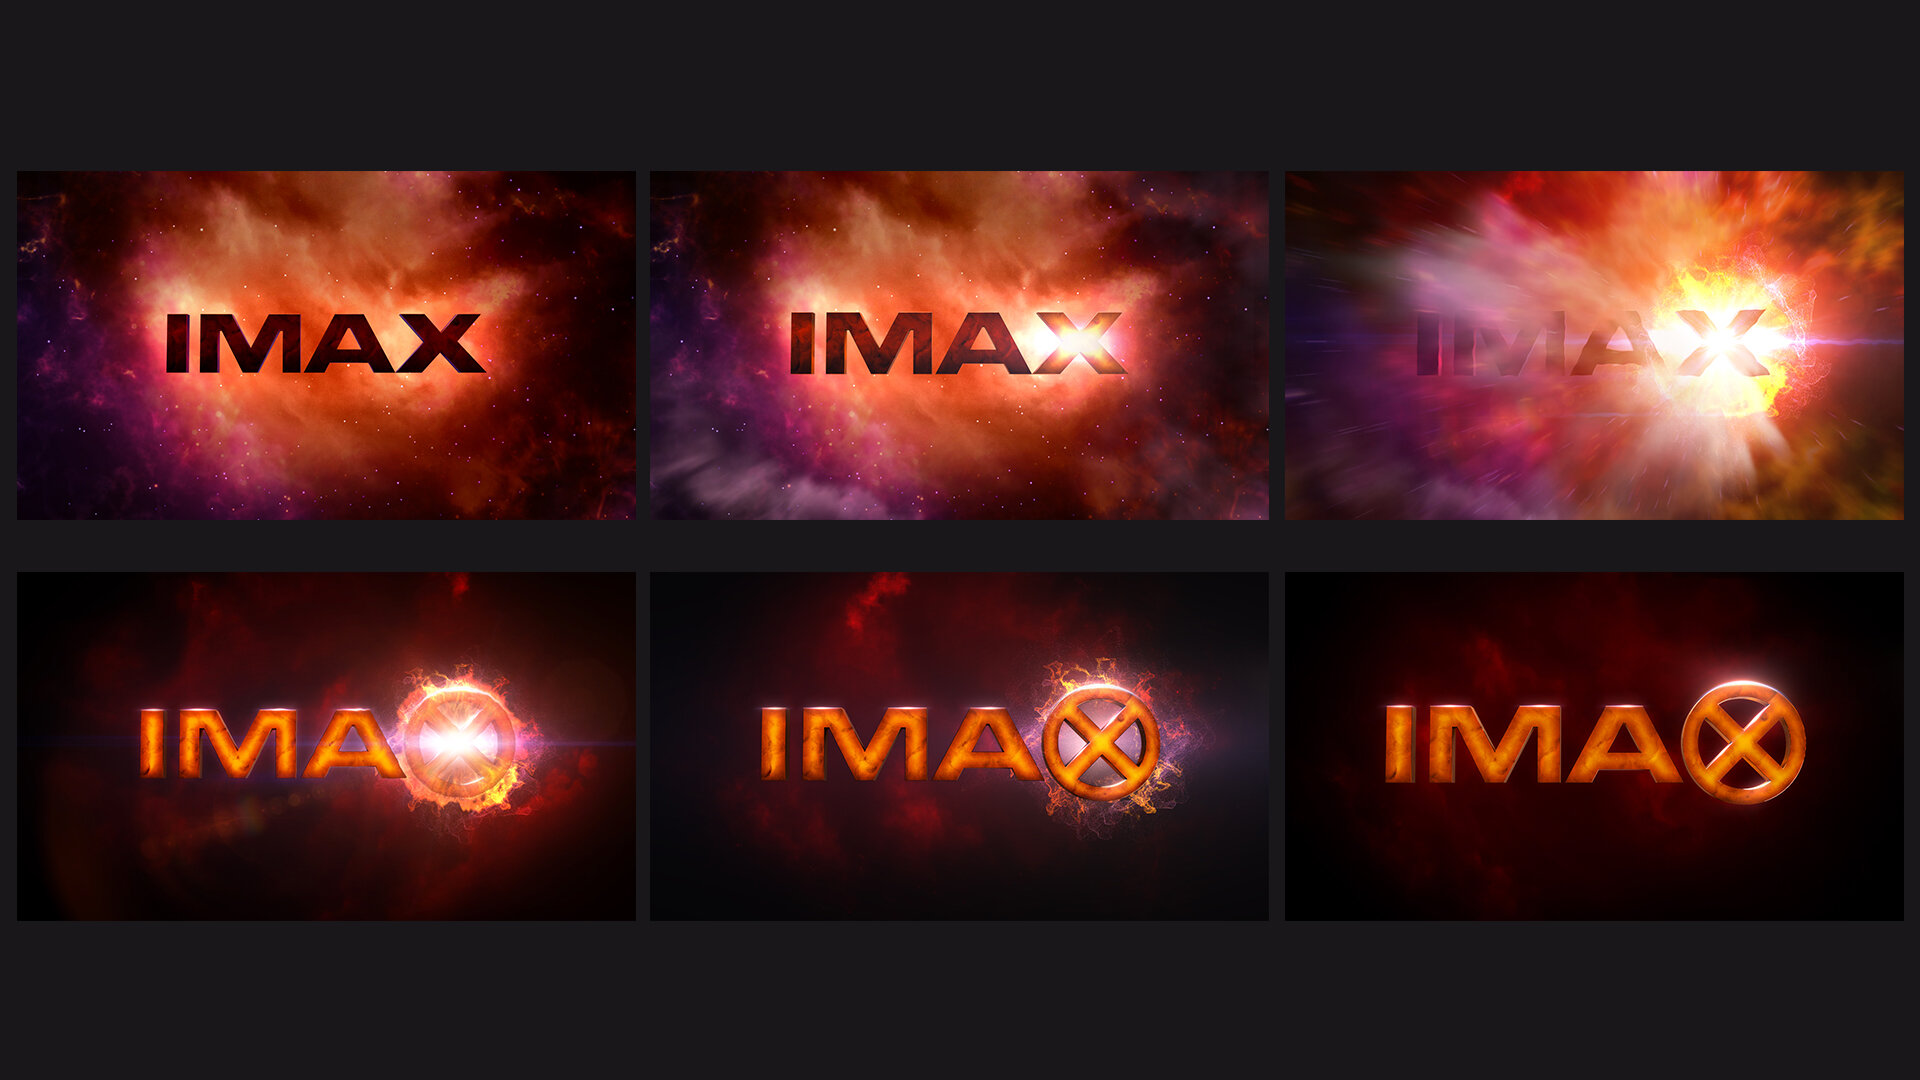 imax_dp_boards_01.jpg